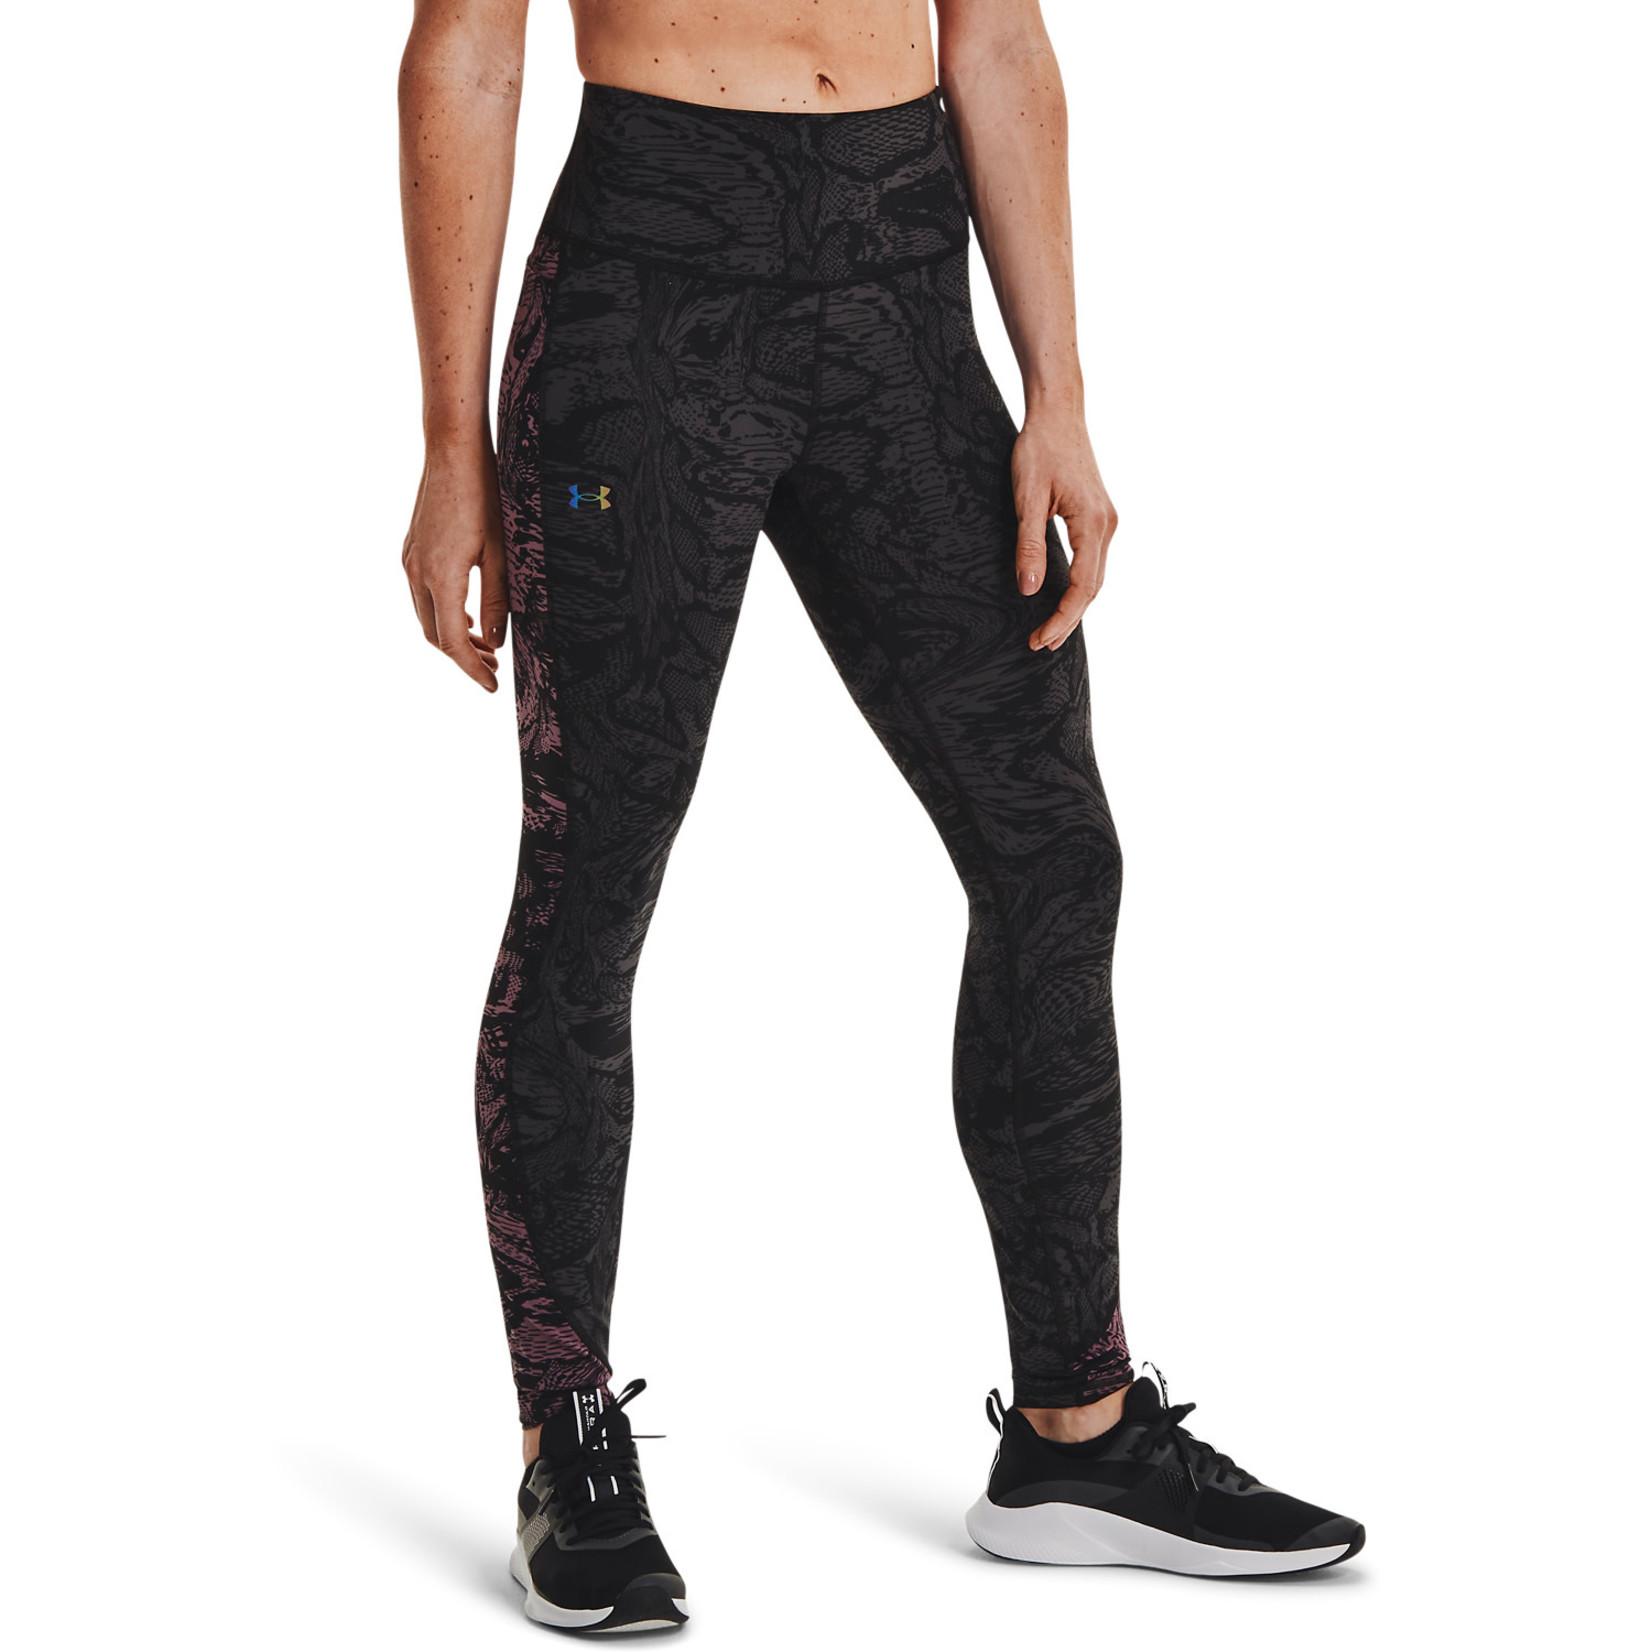 Under Armour UA Rush Legging 6M Novelty-Black